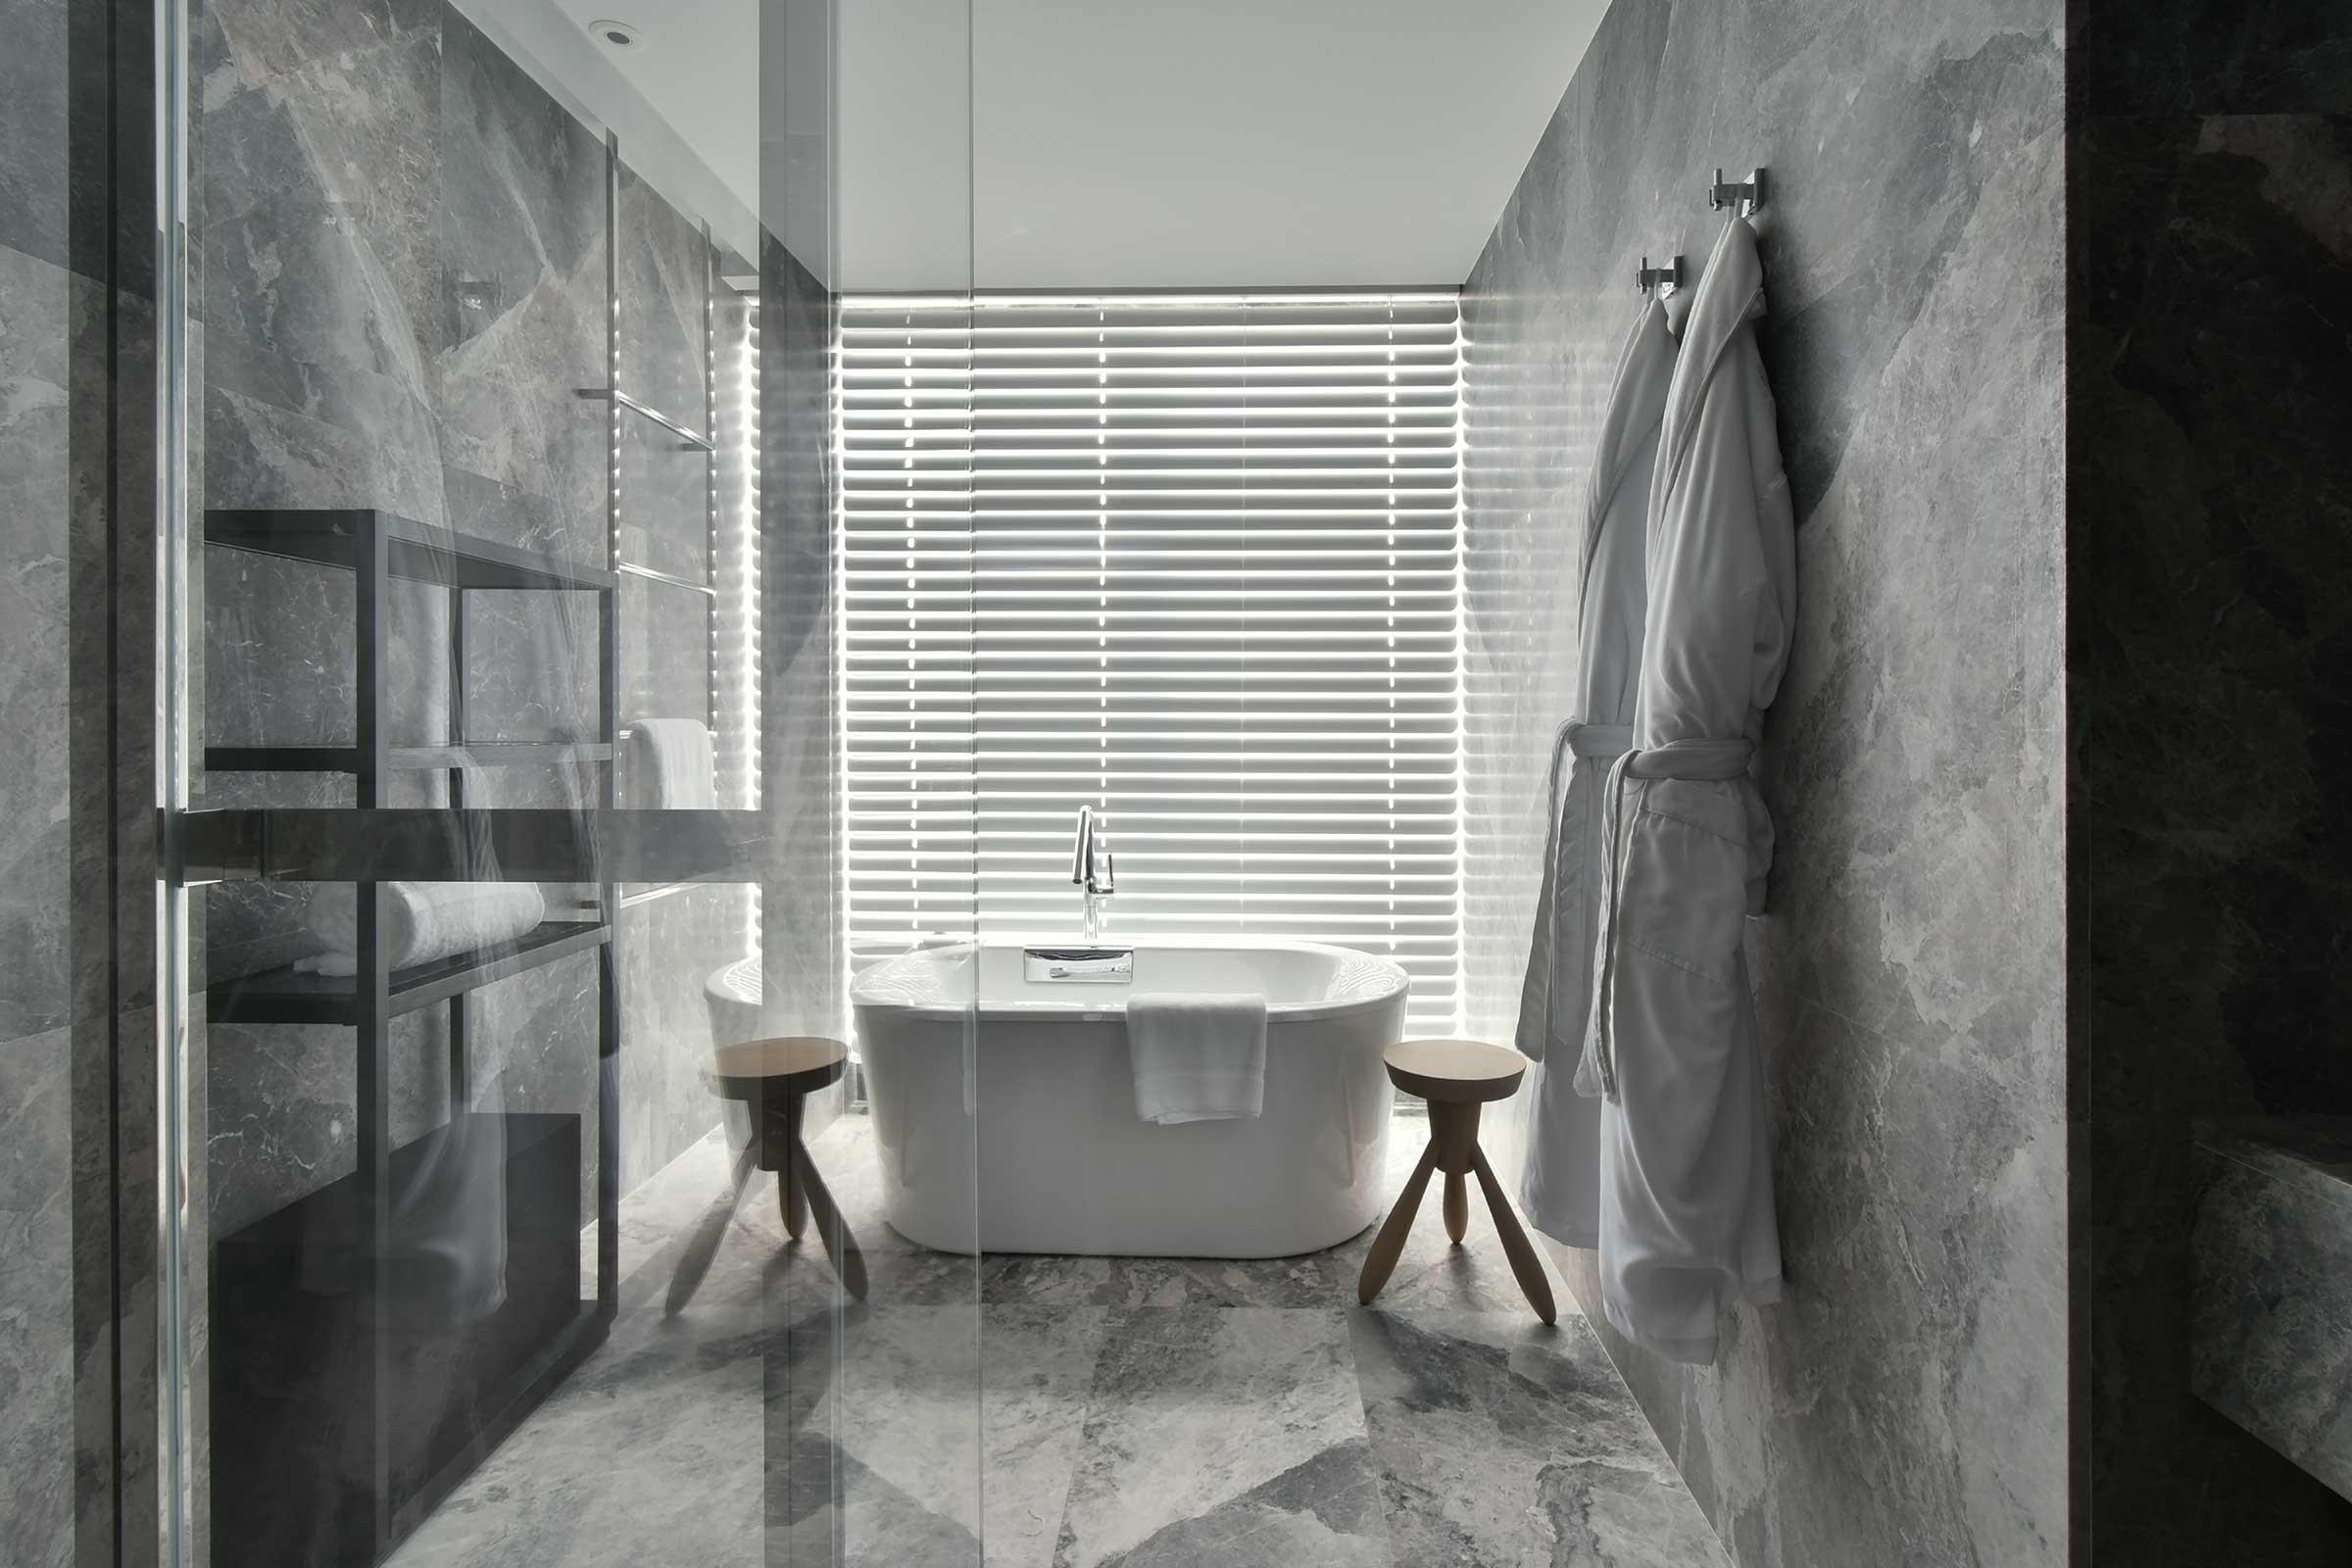 1805-Premier-King晶英大床房浴室.jpg